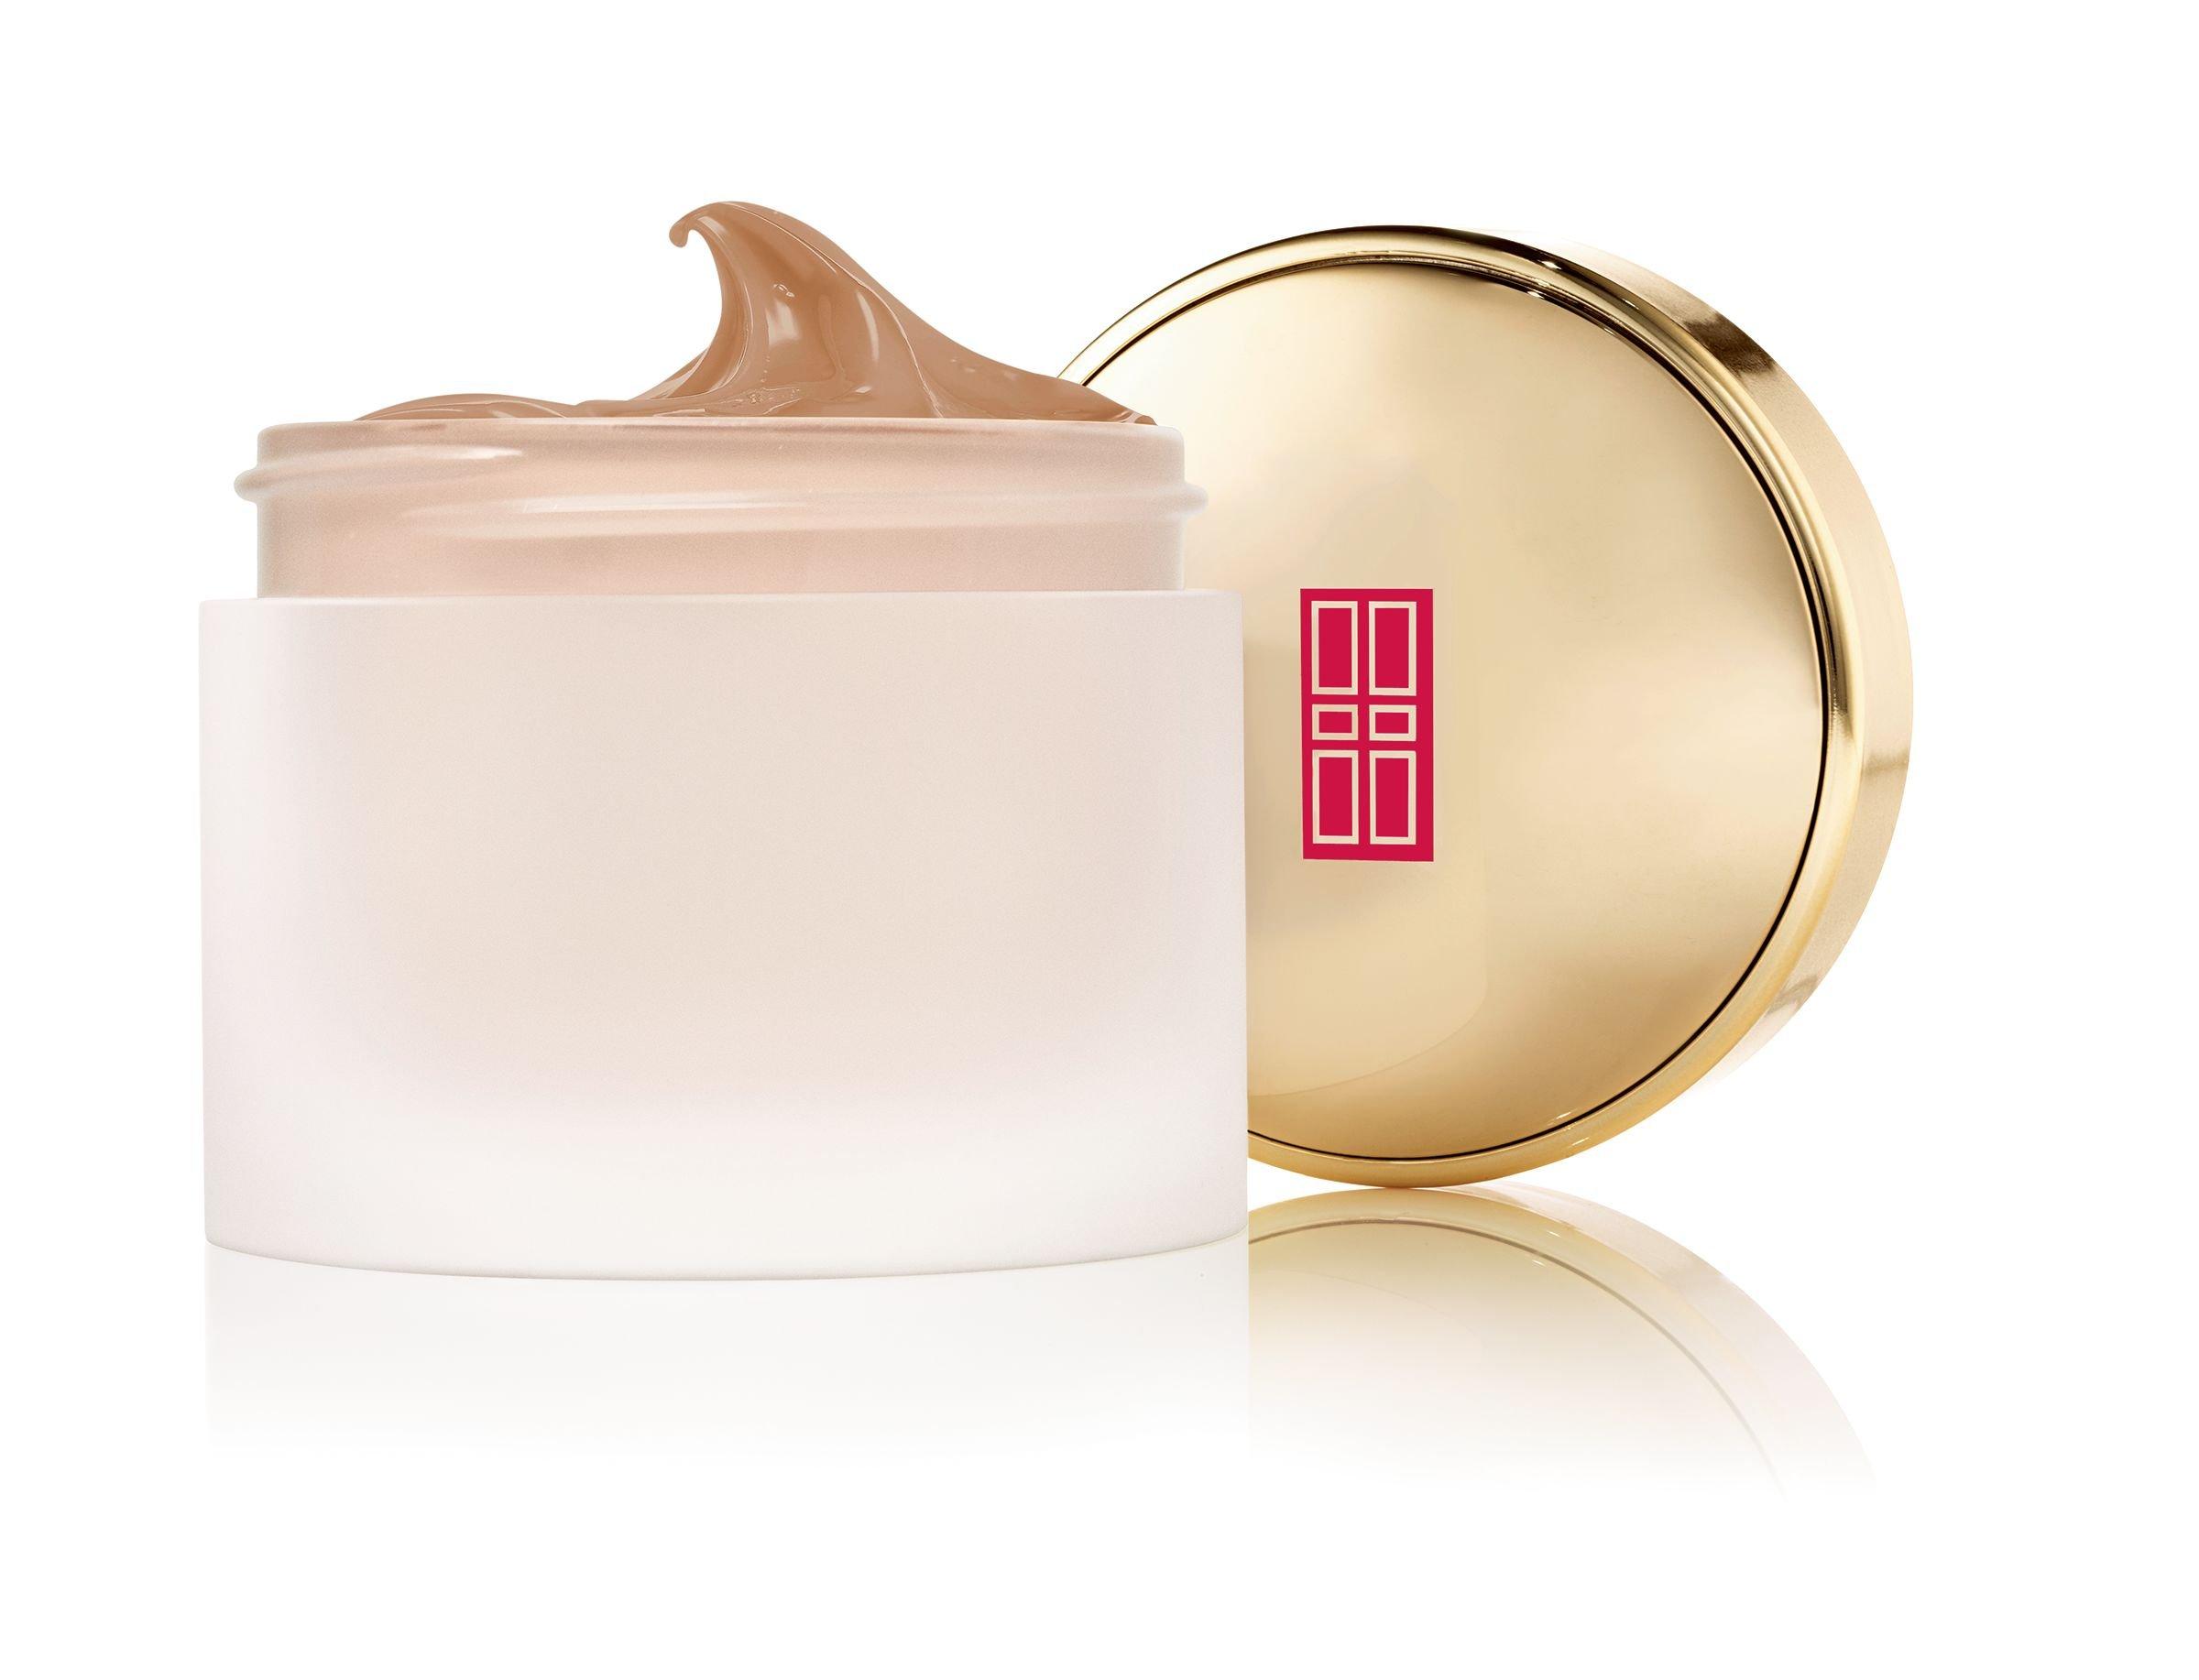 Elizabeth Arden Ceramide Lift & Firm Makeup SPF 15 Broad Spectrum Sunscreen, Beige, 1.0 oz.